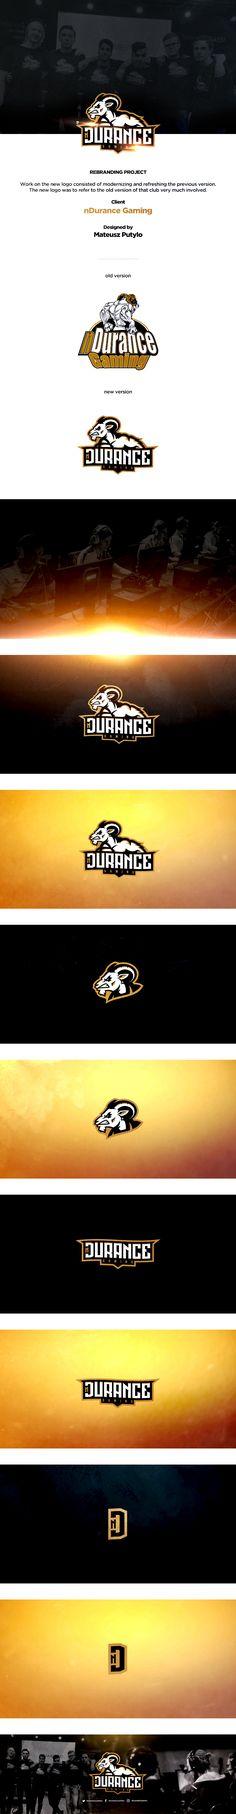 nDurance | Branding on Behance